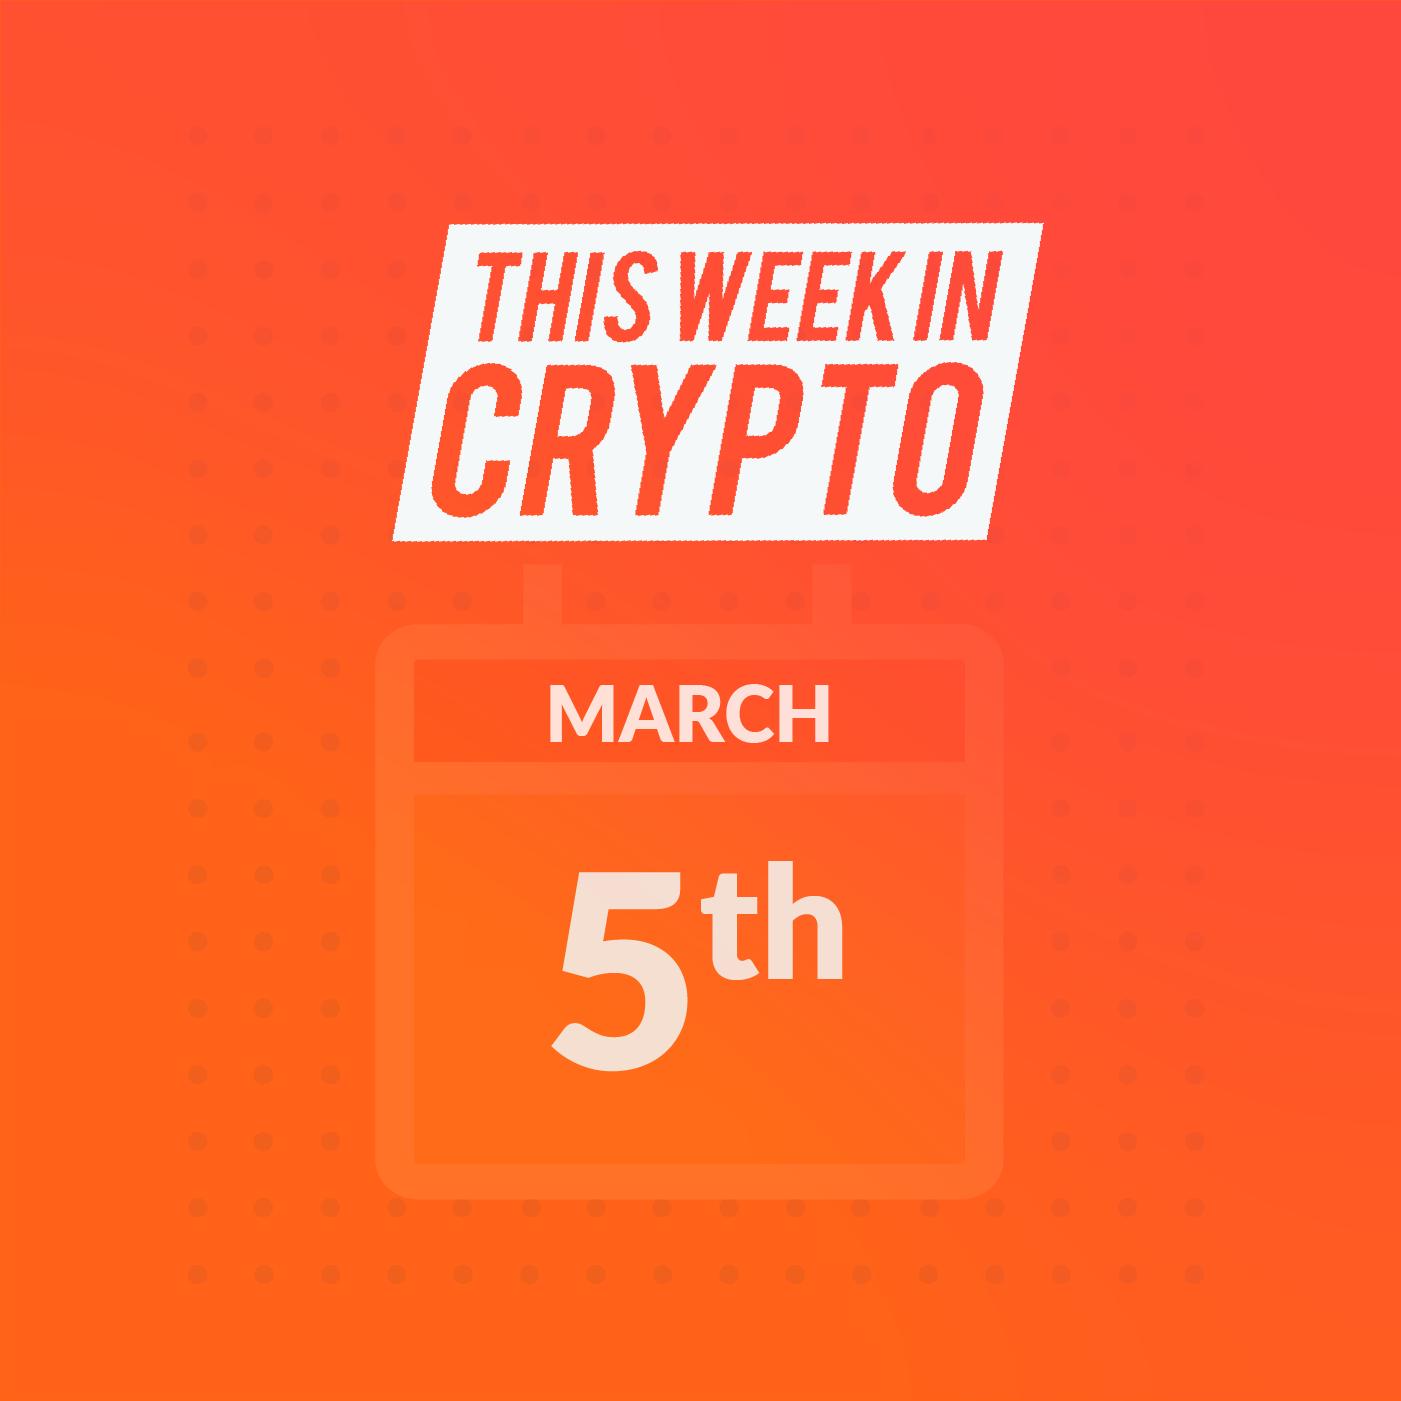 Mar. 5th: Crypto Fund Hack Results In Massive Data Leak